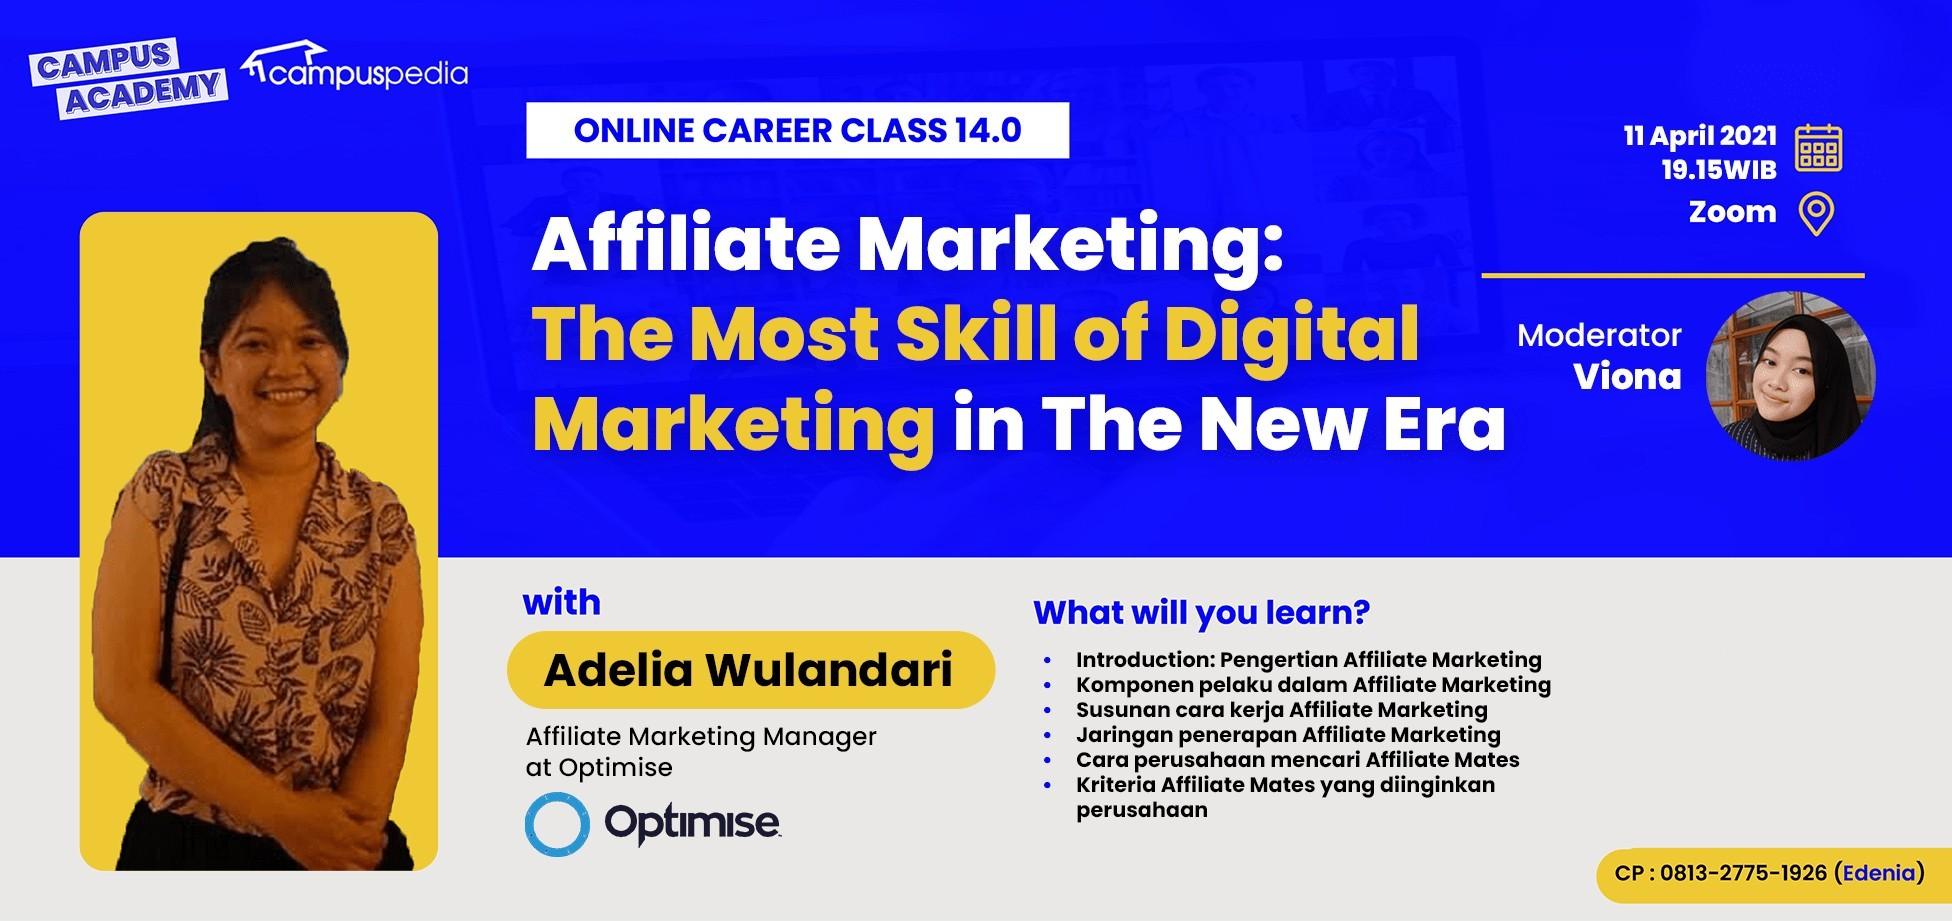 Affiliate Marketing: The Most Skill of Digital Marketing in The New Era